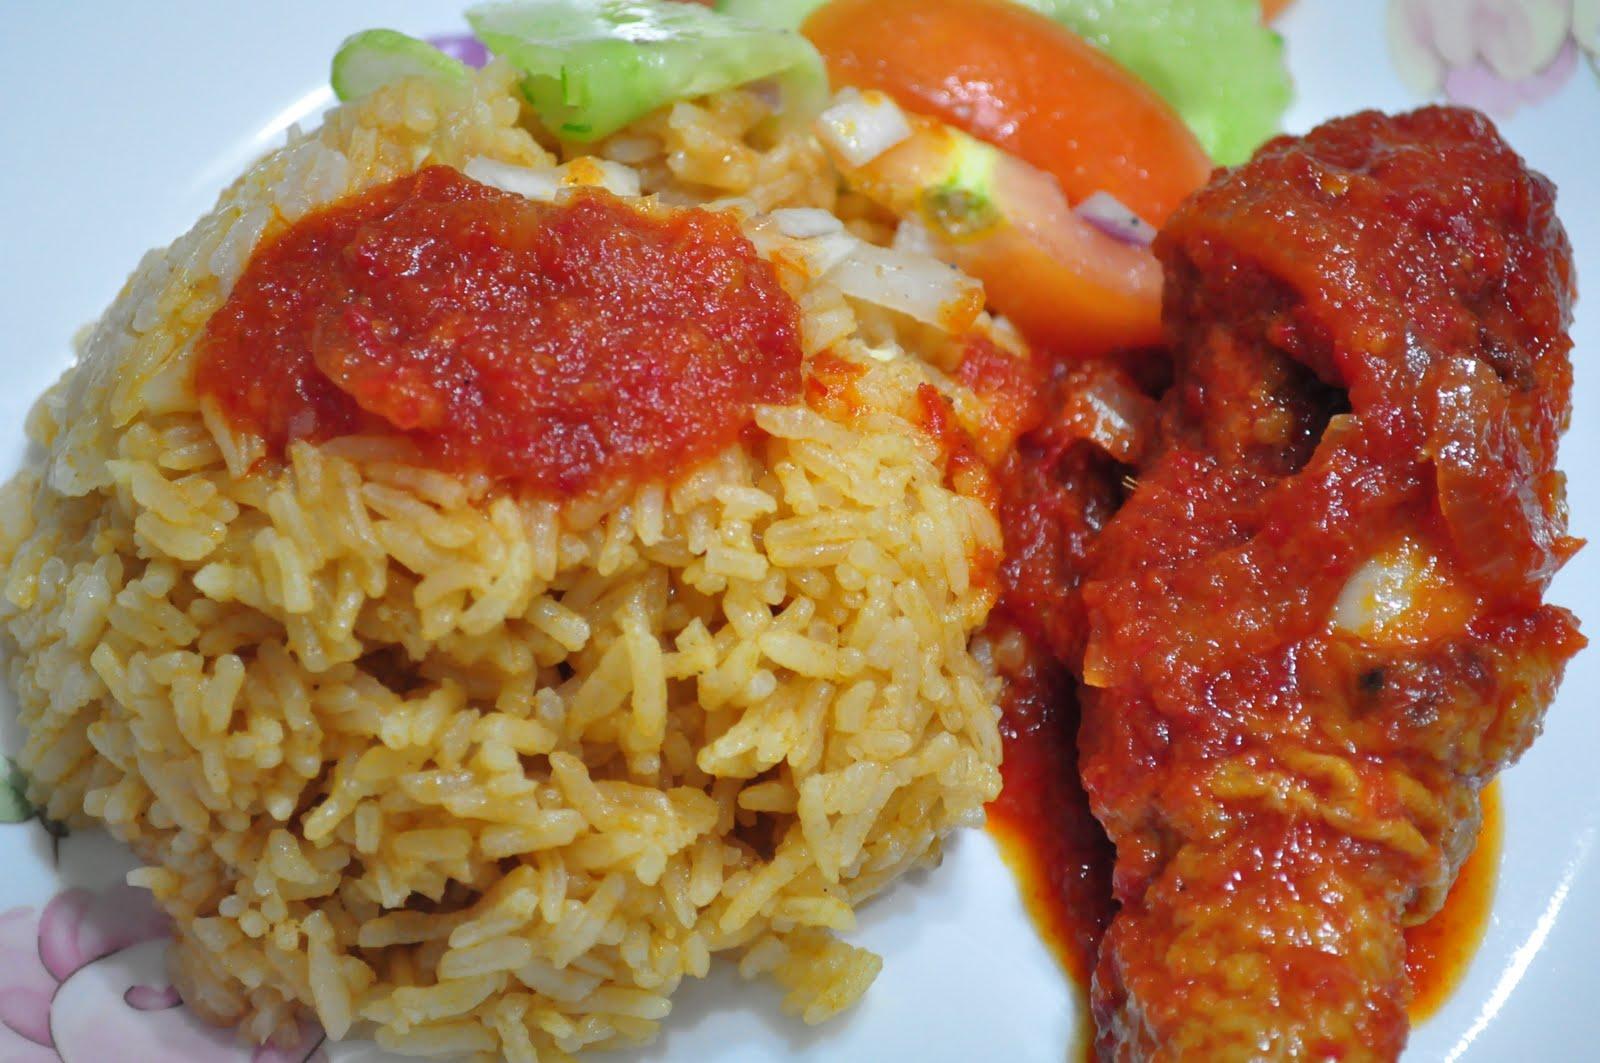 Inilar Resepi Nasi Tomato Ayam Masak Merah Yang Enak Dan Lezat Aneka Resepi Nasi